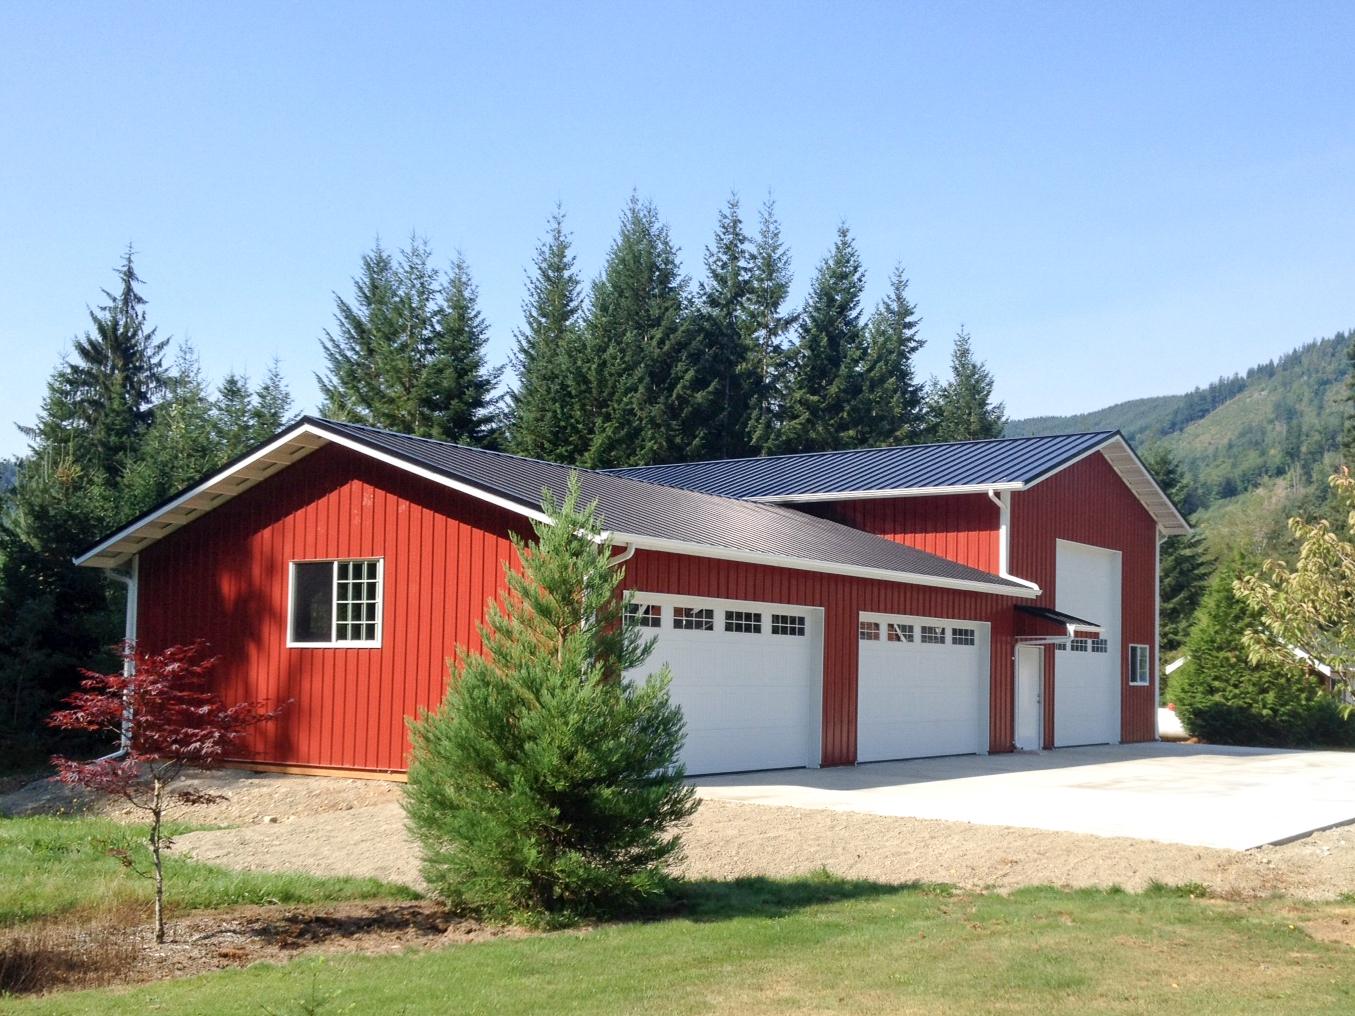 stall barn, barn, everson post frame construction, pole buildings